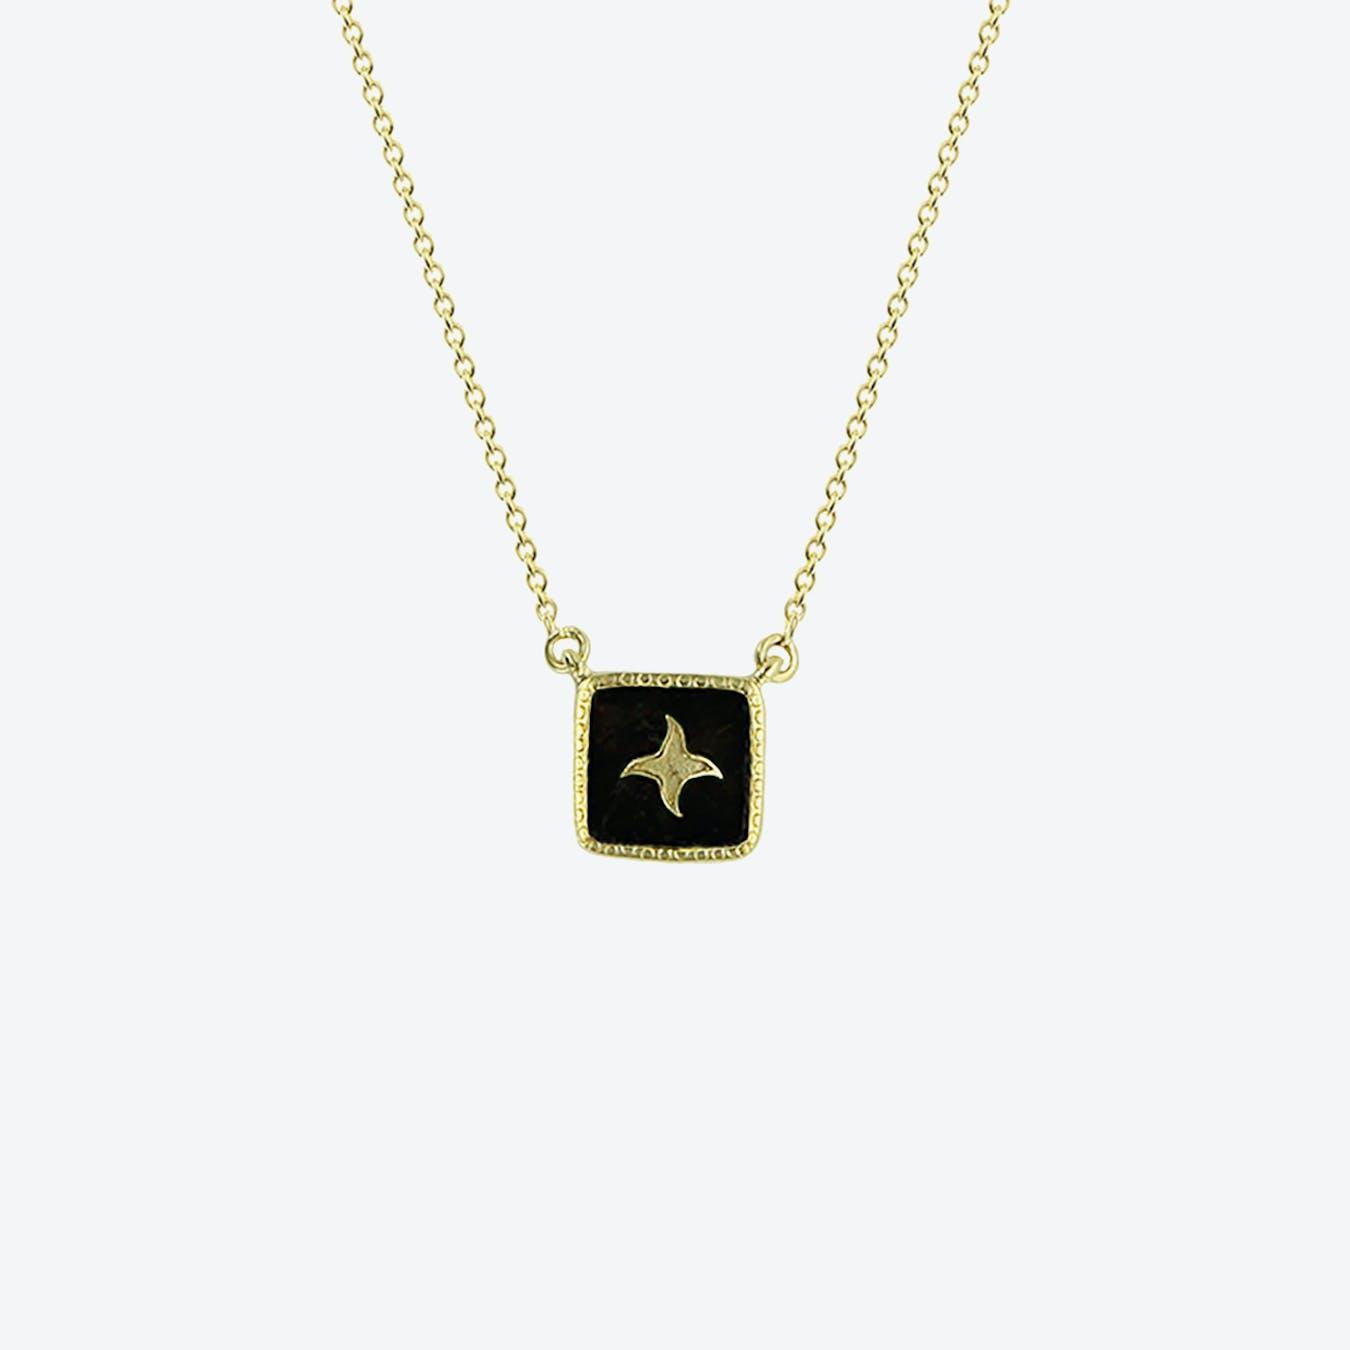 Meruba Necklace - Textured Onyx